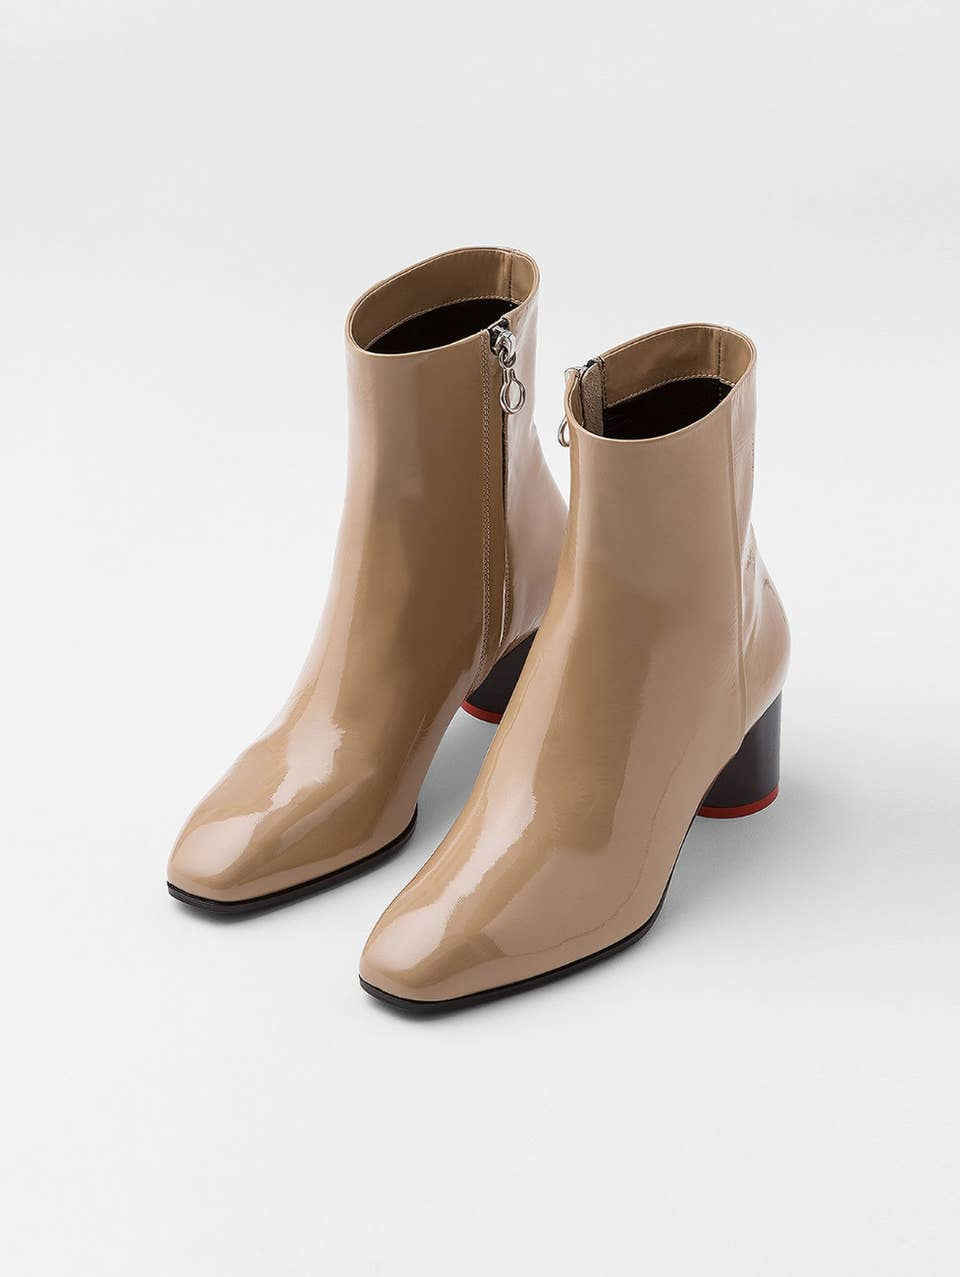 15 Stiefeletten mit Karree Schuhspitze